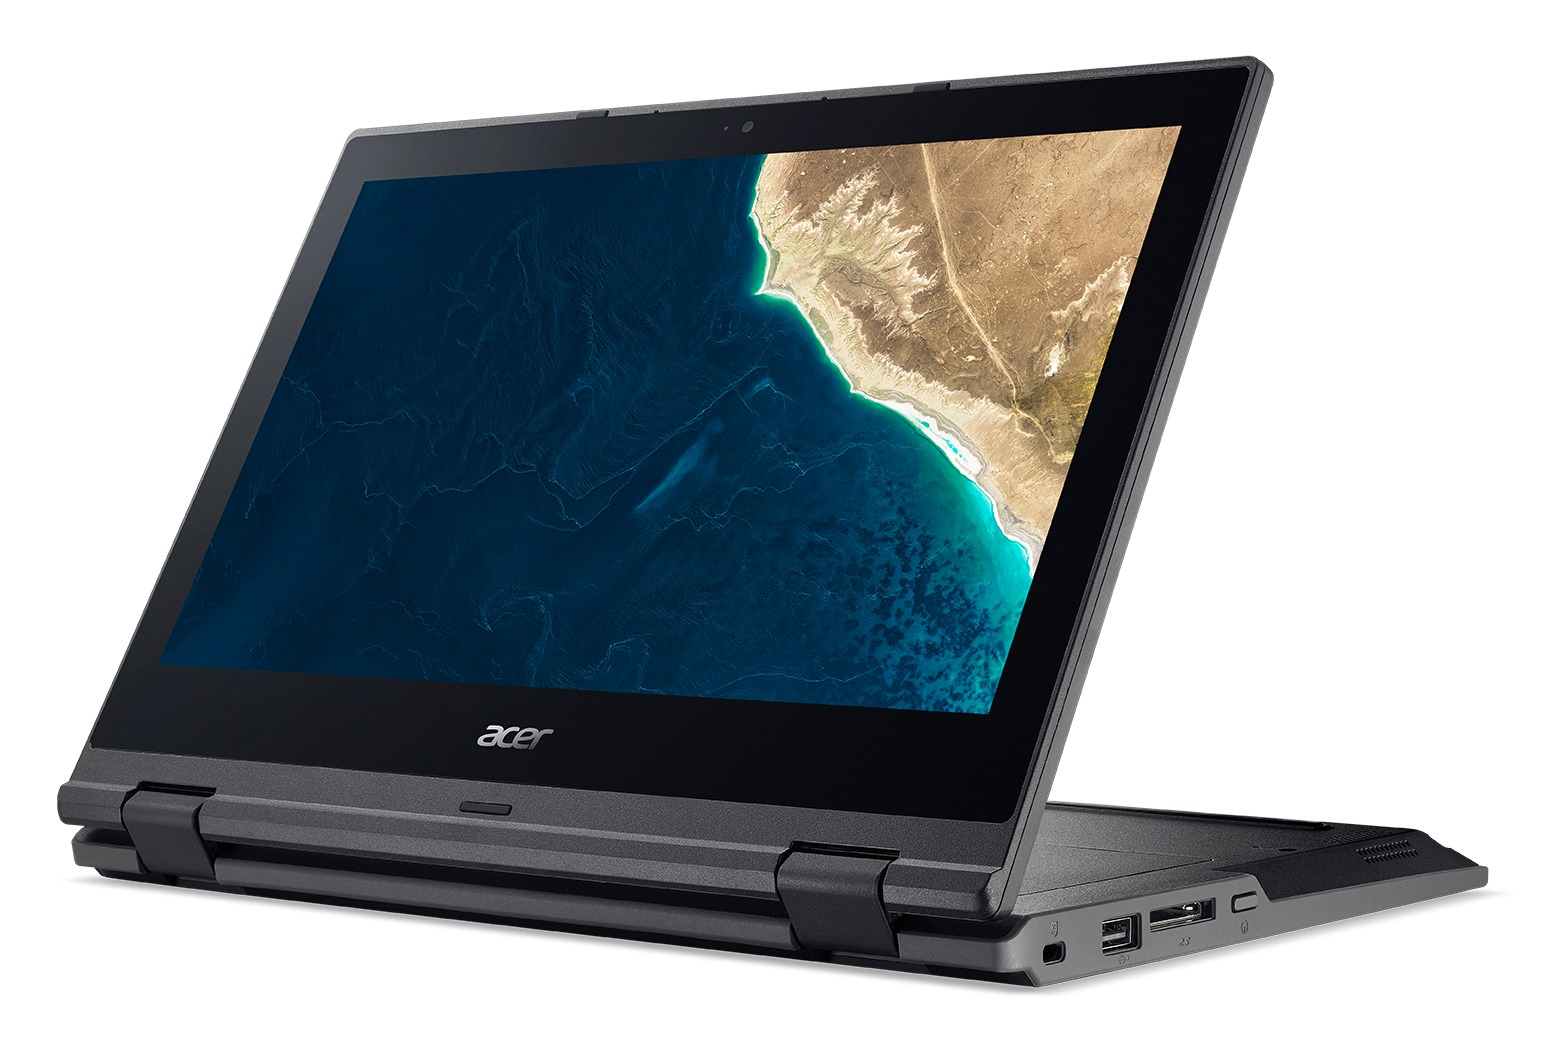 Korting Acer TravelMate Spin B1 TMB118 G2 R C6RX laptop